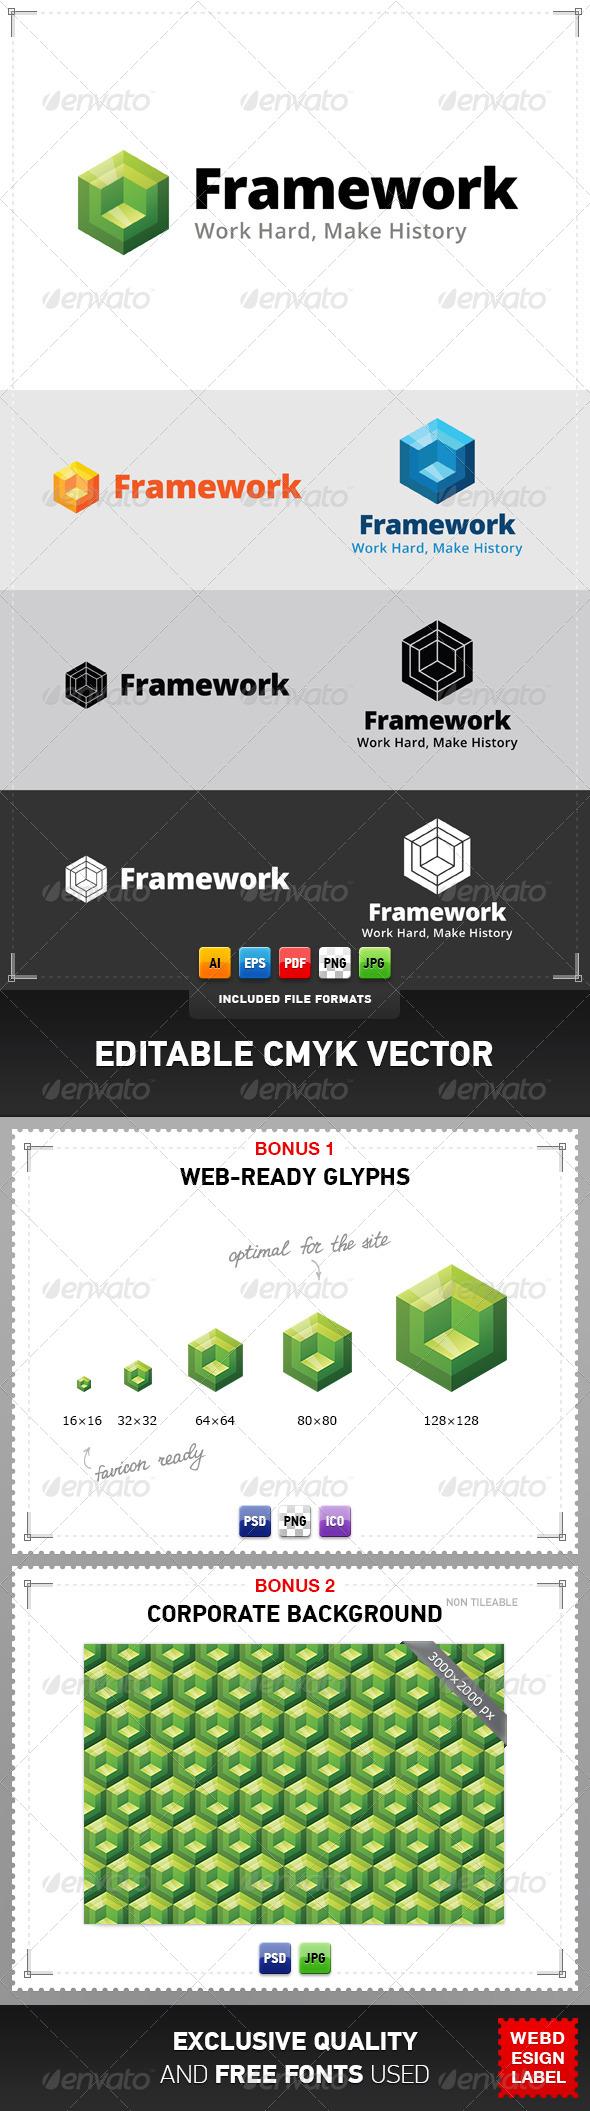 Framework Logo - Vector Abstract